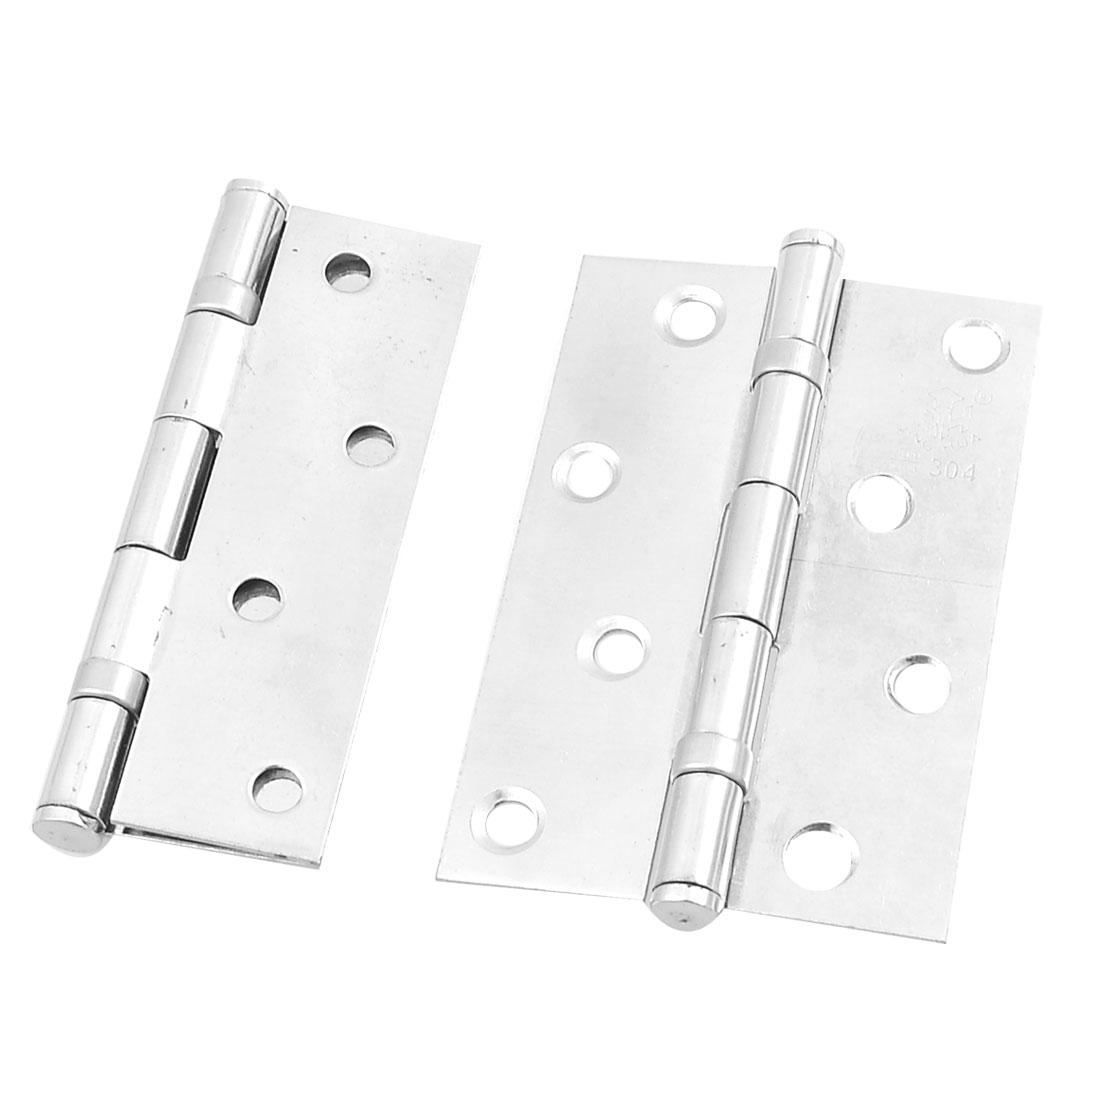 "2 Pcs 3.5"" Long Silver Tone Stainless Steel Rotatable Door Hinges w Screws"